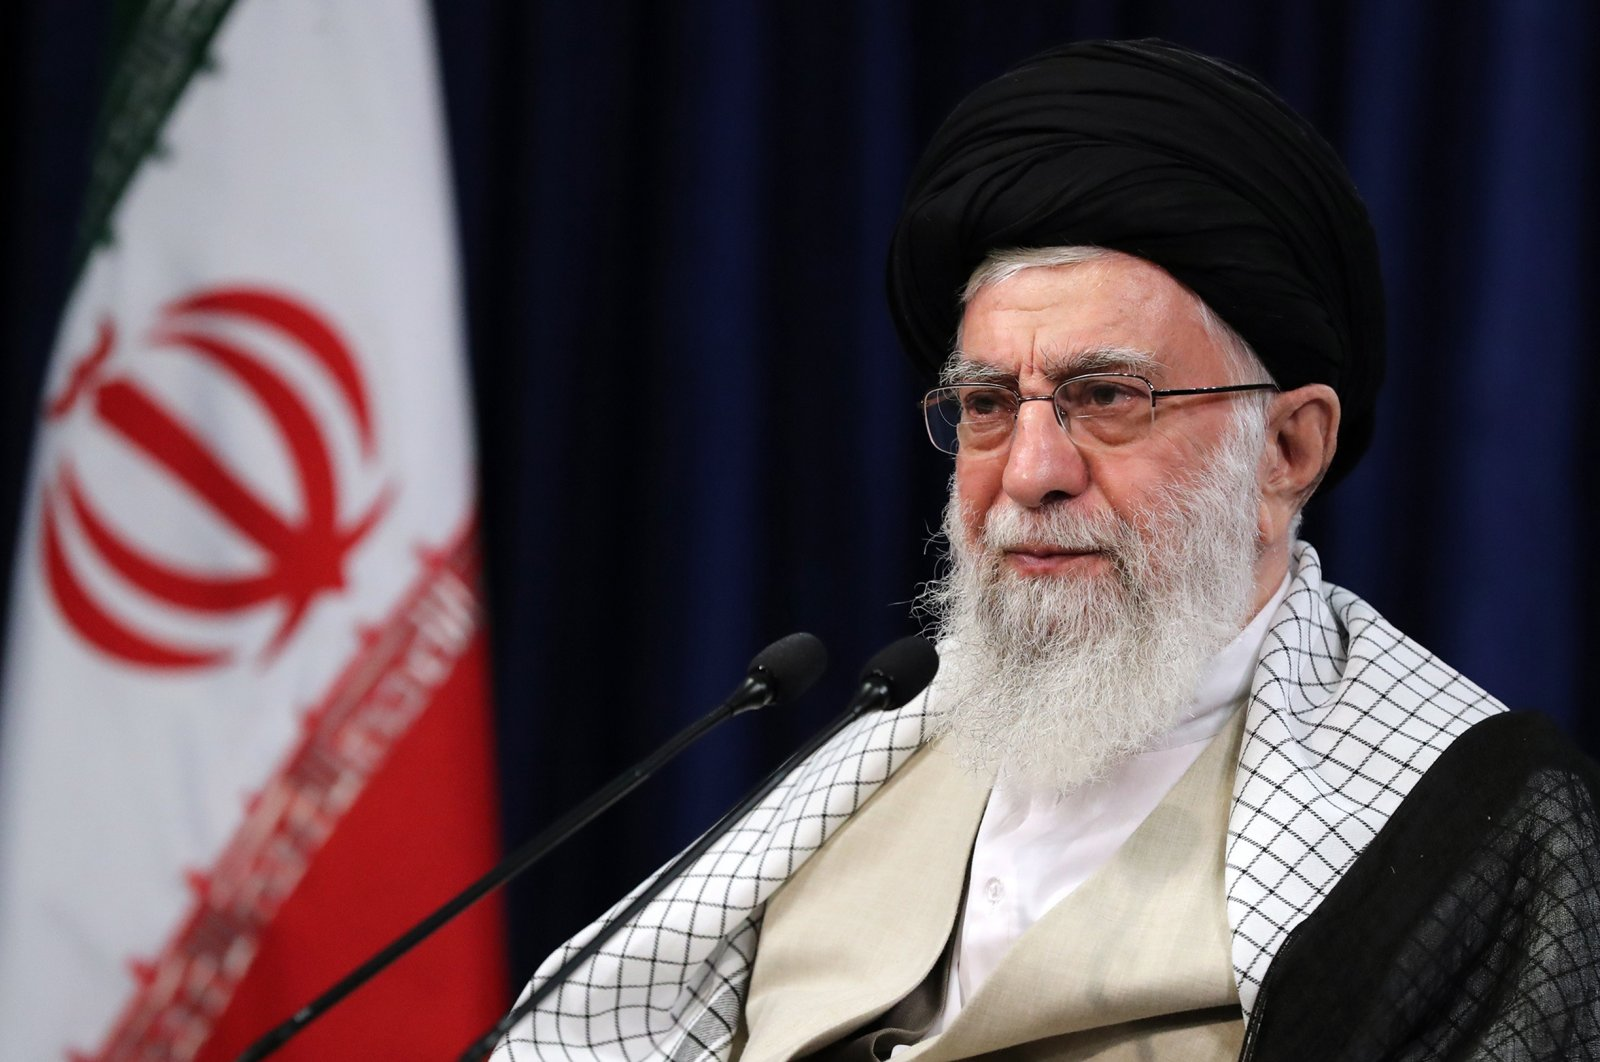 Iranian Supreme Leader Ayatollah Ali Khamenei addresses the nation in a live TV speech on the occasion of Eid al-Adha, Tehran, Iran, July 31, 2020. (AFP Photo)